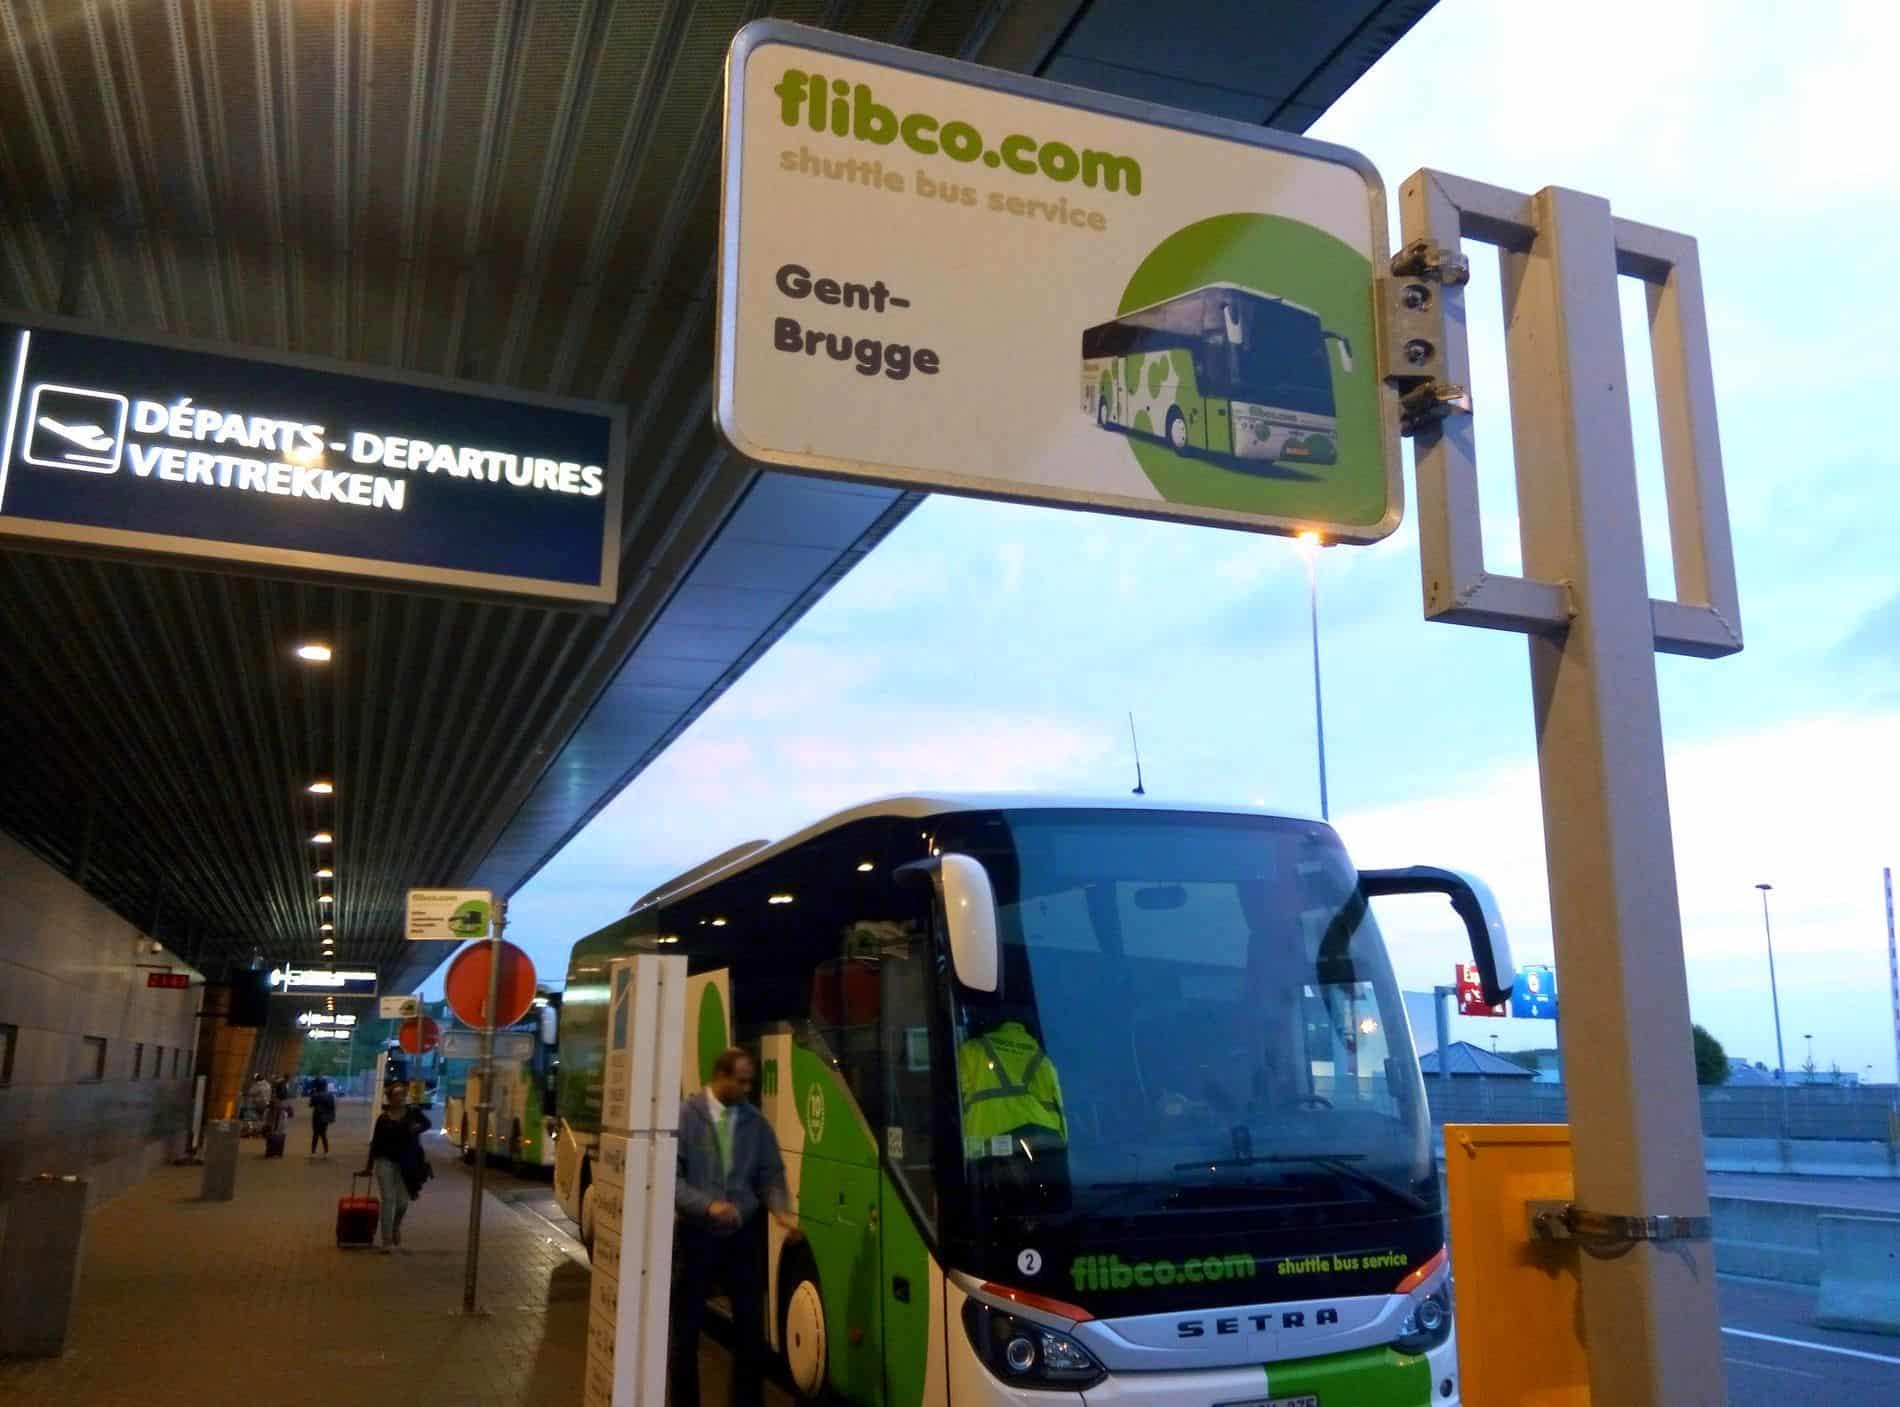 bus_aeroporto_charleoi_brugge_flibco